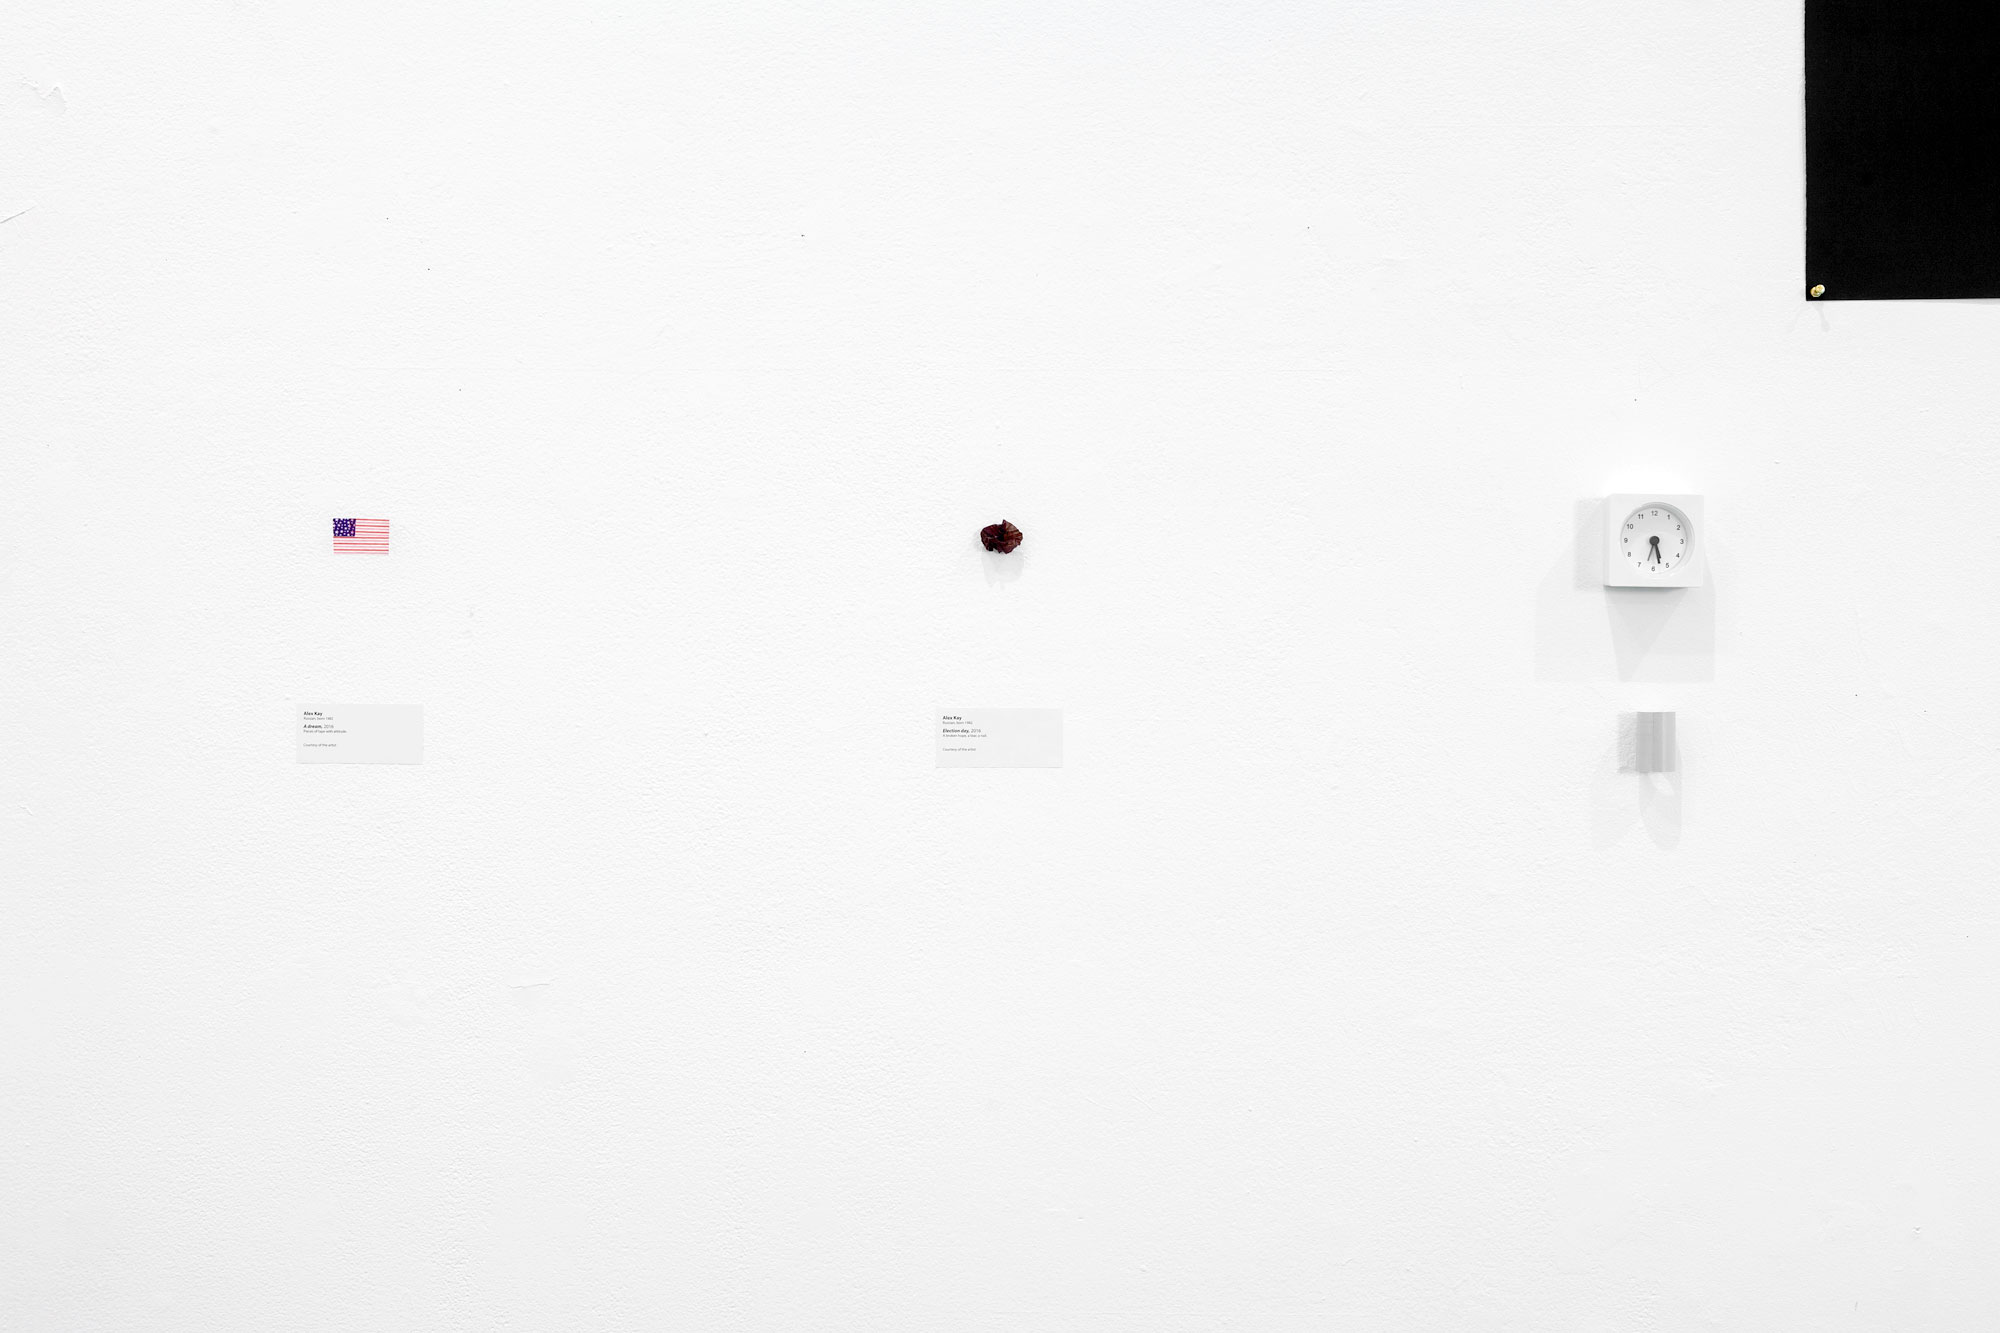 Meshki: Royal Black, Potato Sacks, i.e., Meaningmization, Small Objects #1 by Alex Kay